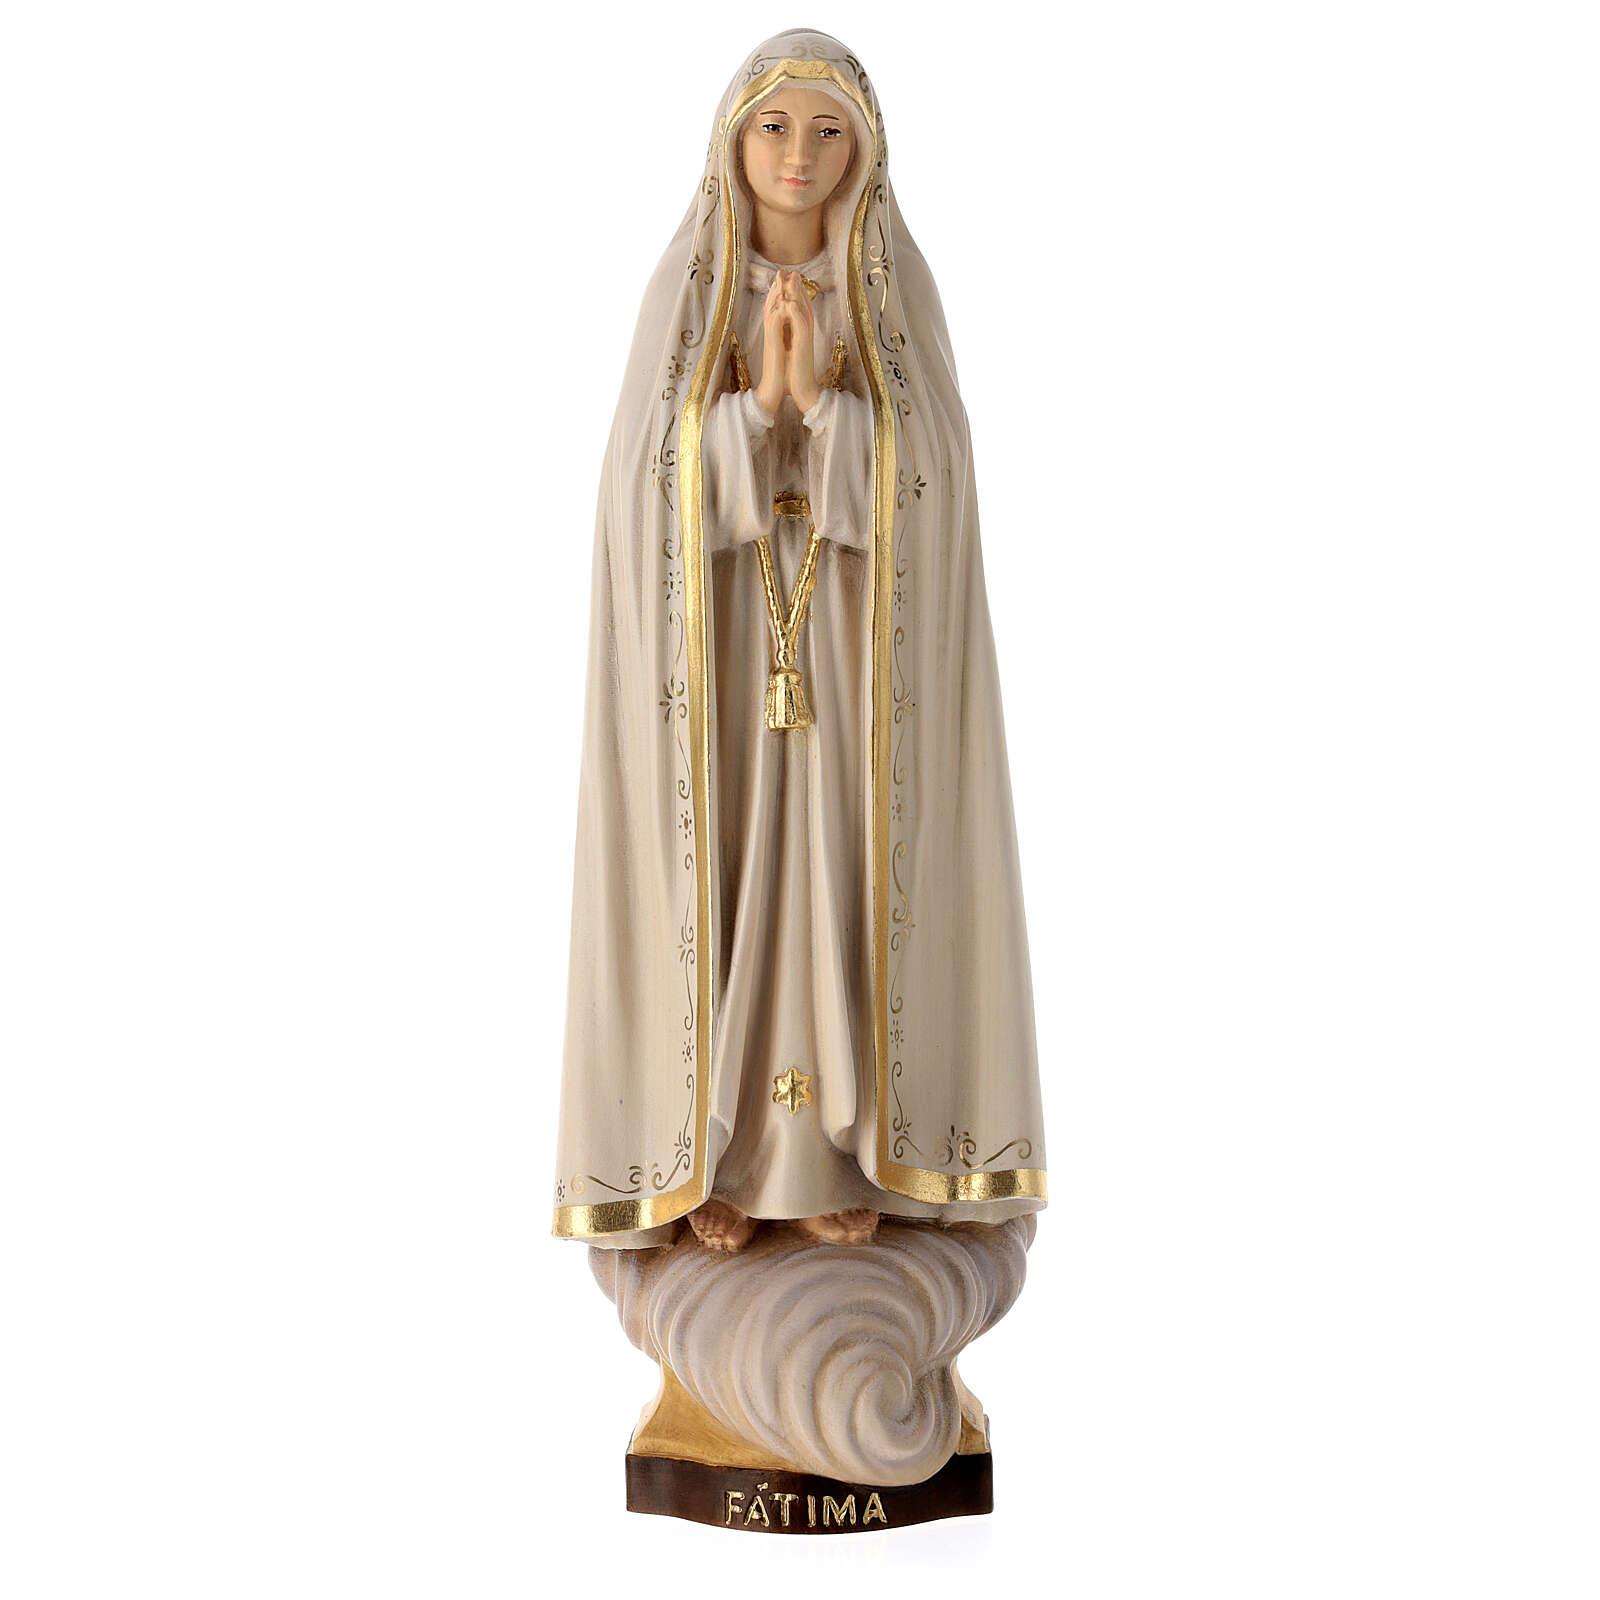 Statua Madonna di Fátima Capelinha legno dipinto Val Gardena 4